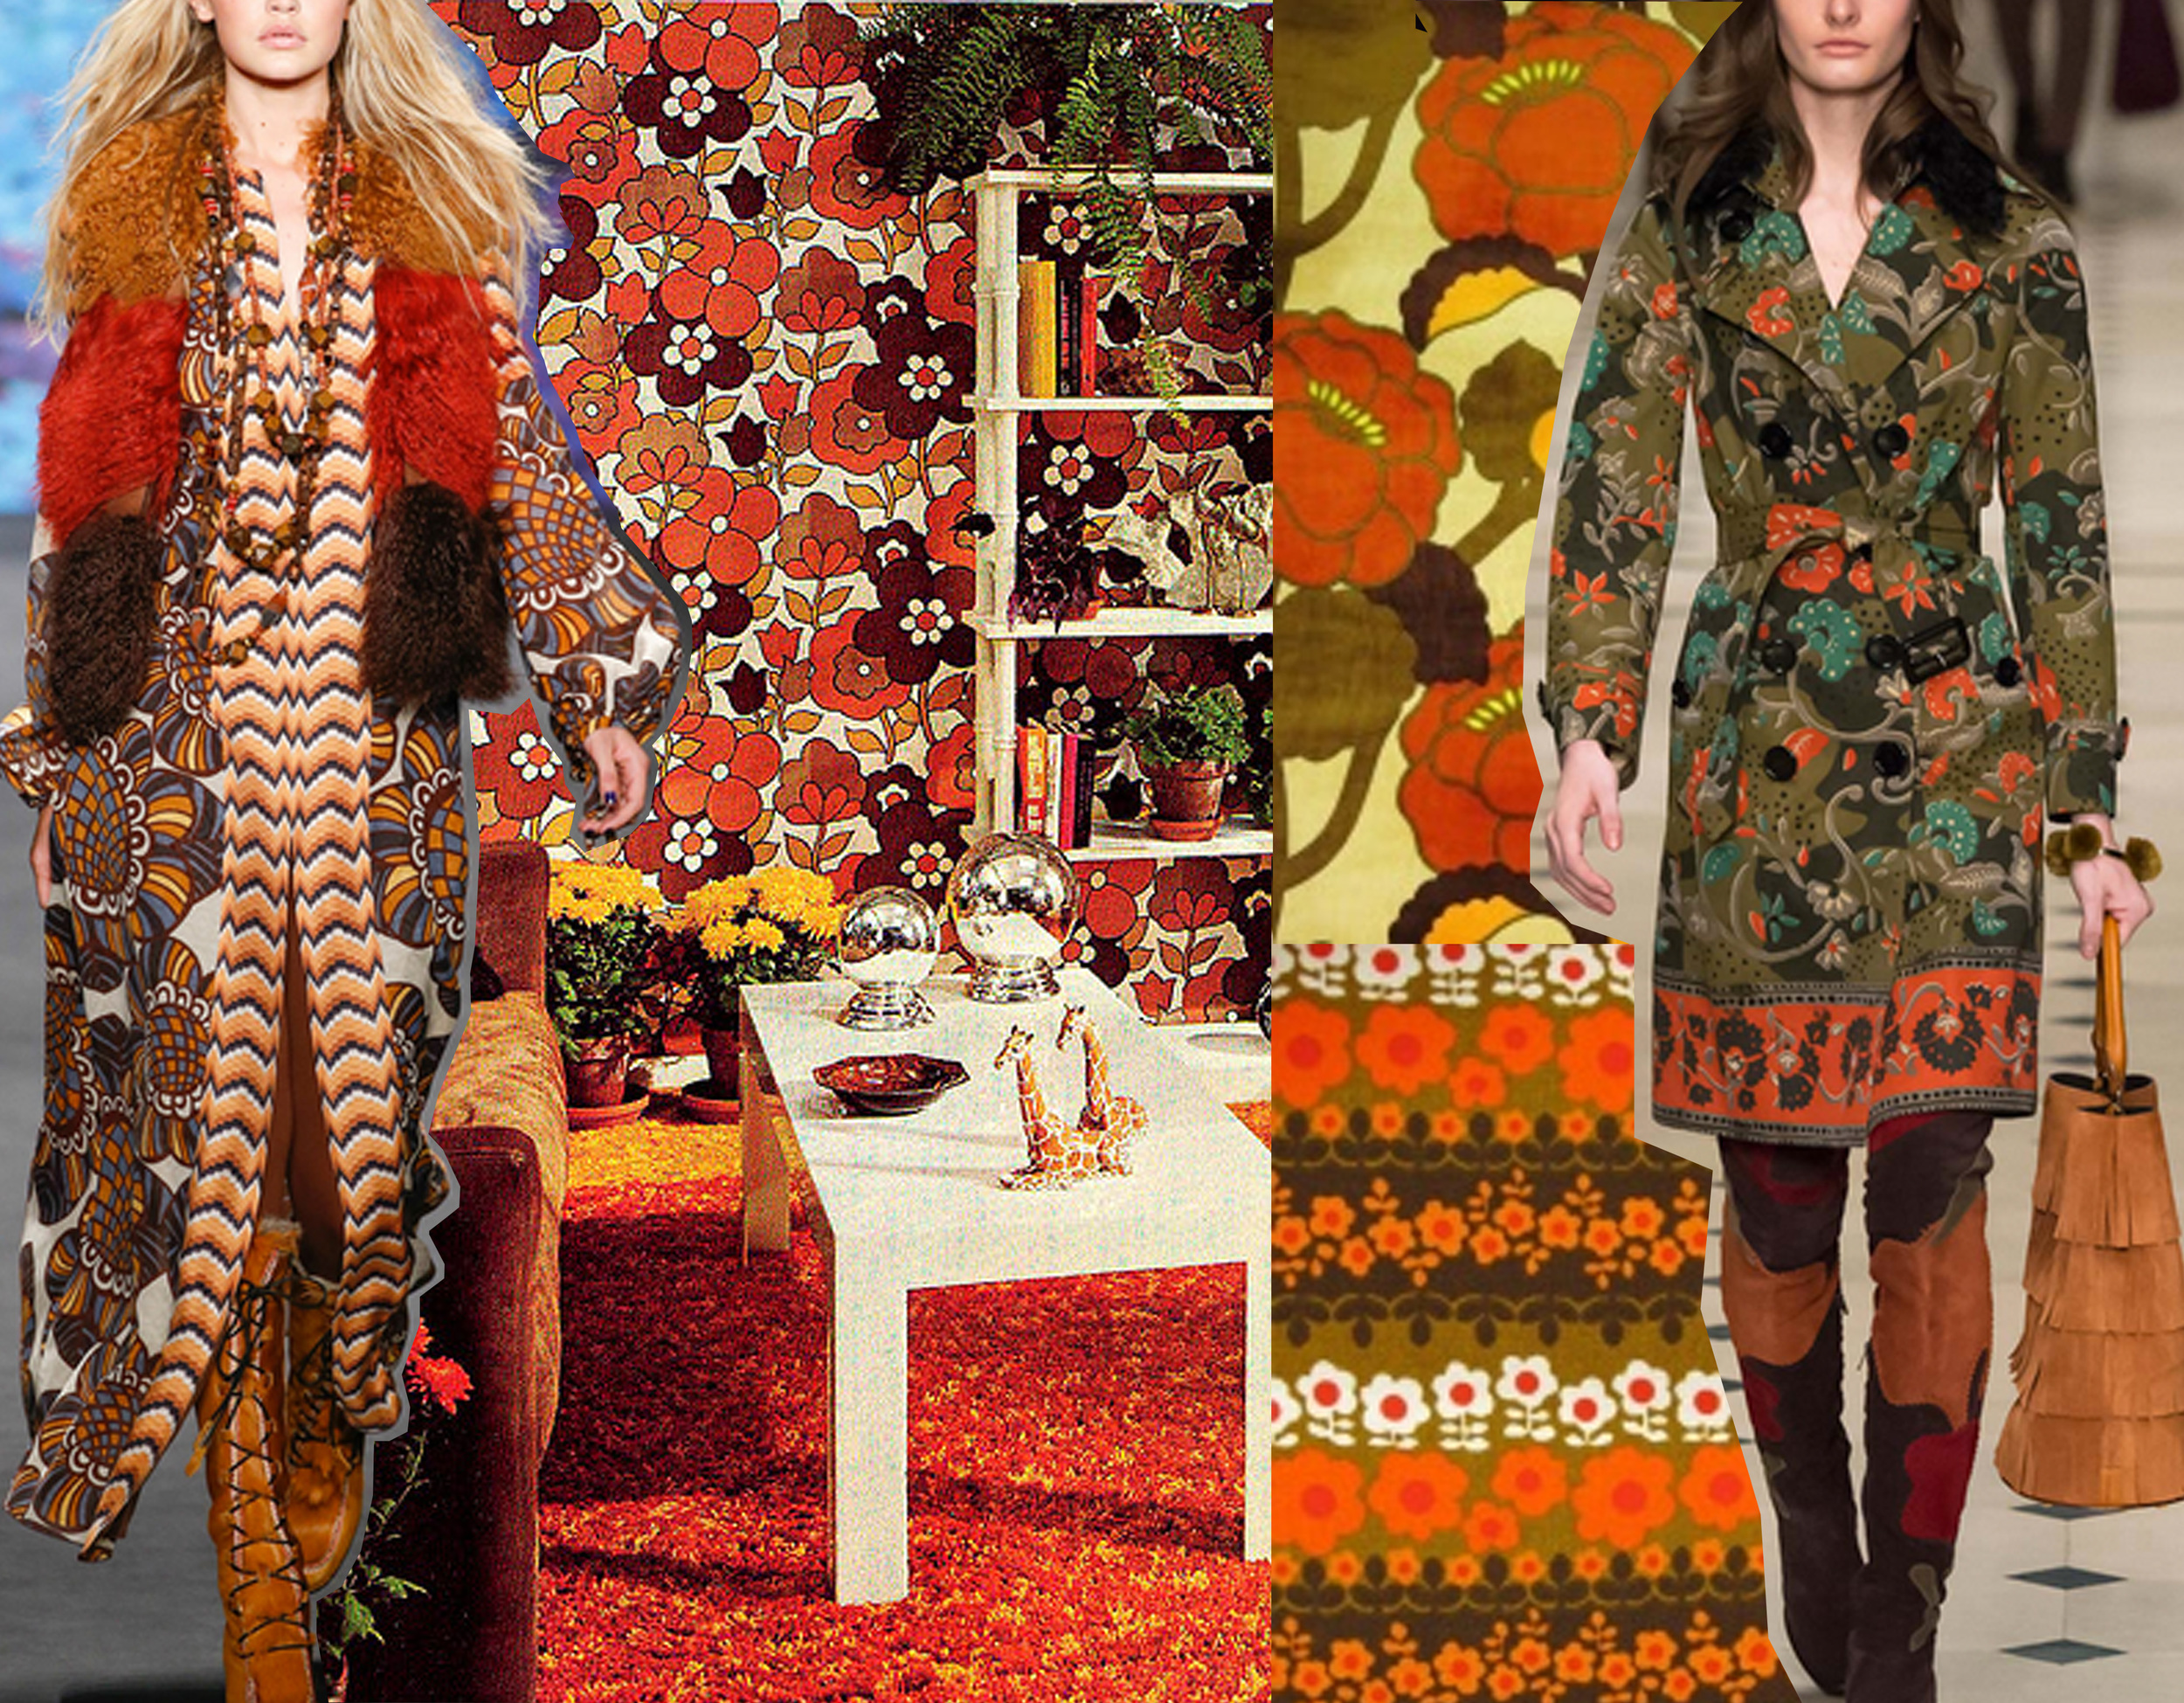 A/W 2015  Anna Sui  - vintage wallpaper and fabrics  Vintage Wallpaper  - A/W 2015  Burberry Prorsum